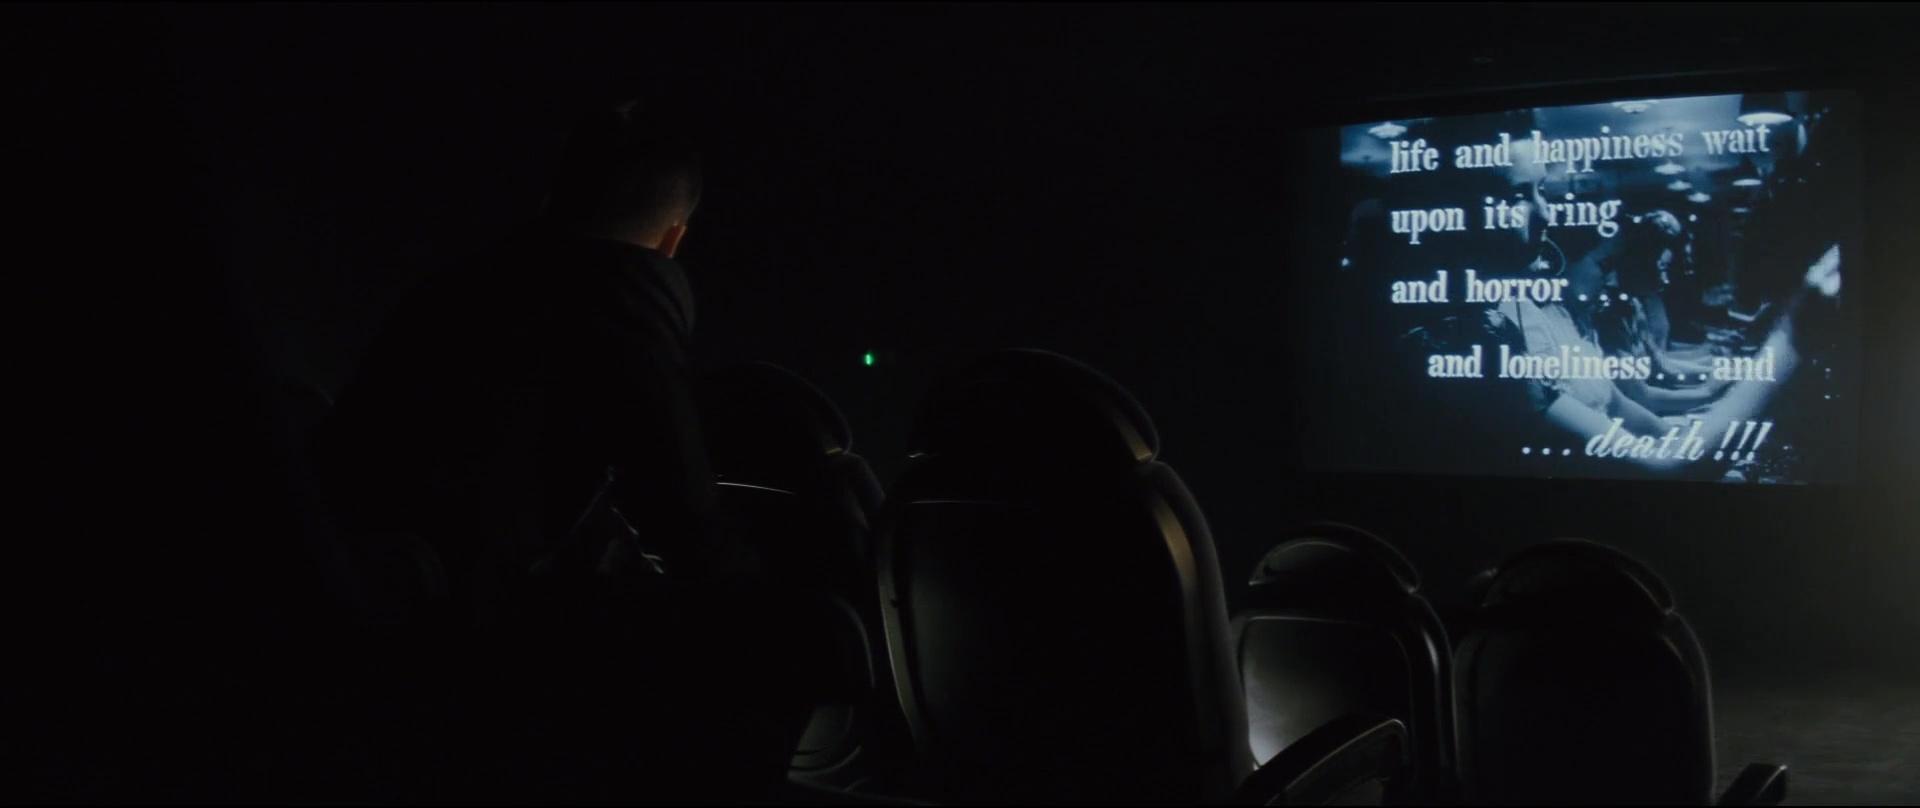 Jack Ryan Shadow Recruit film still 6